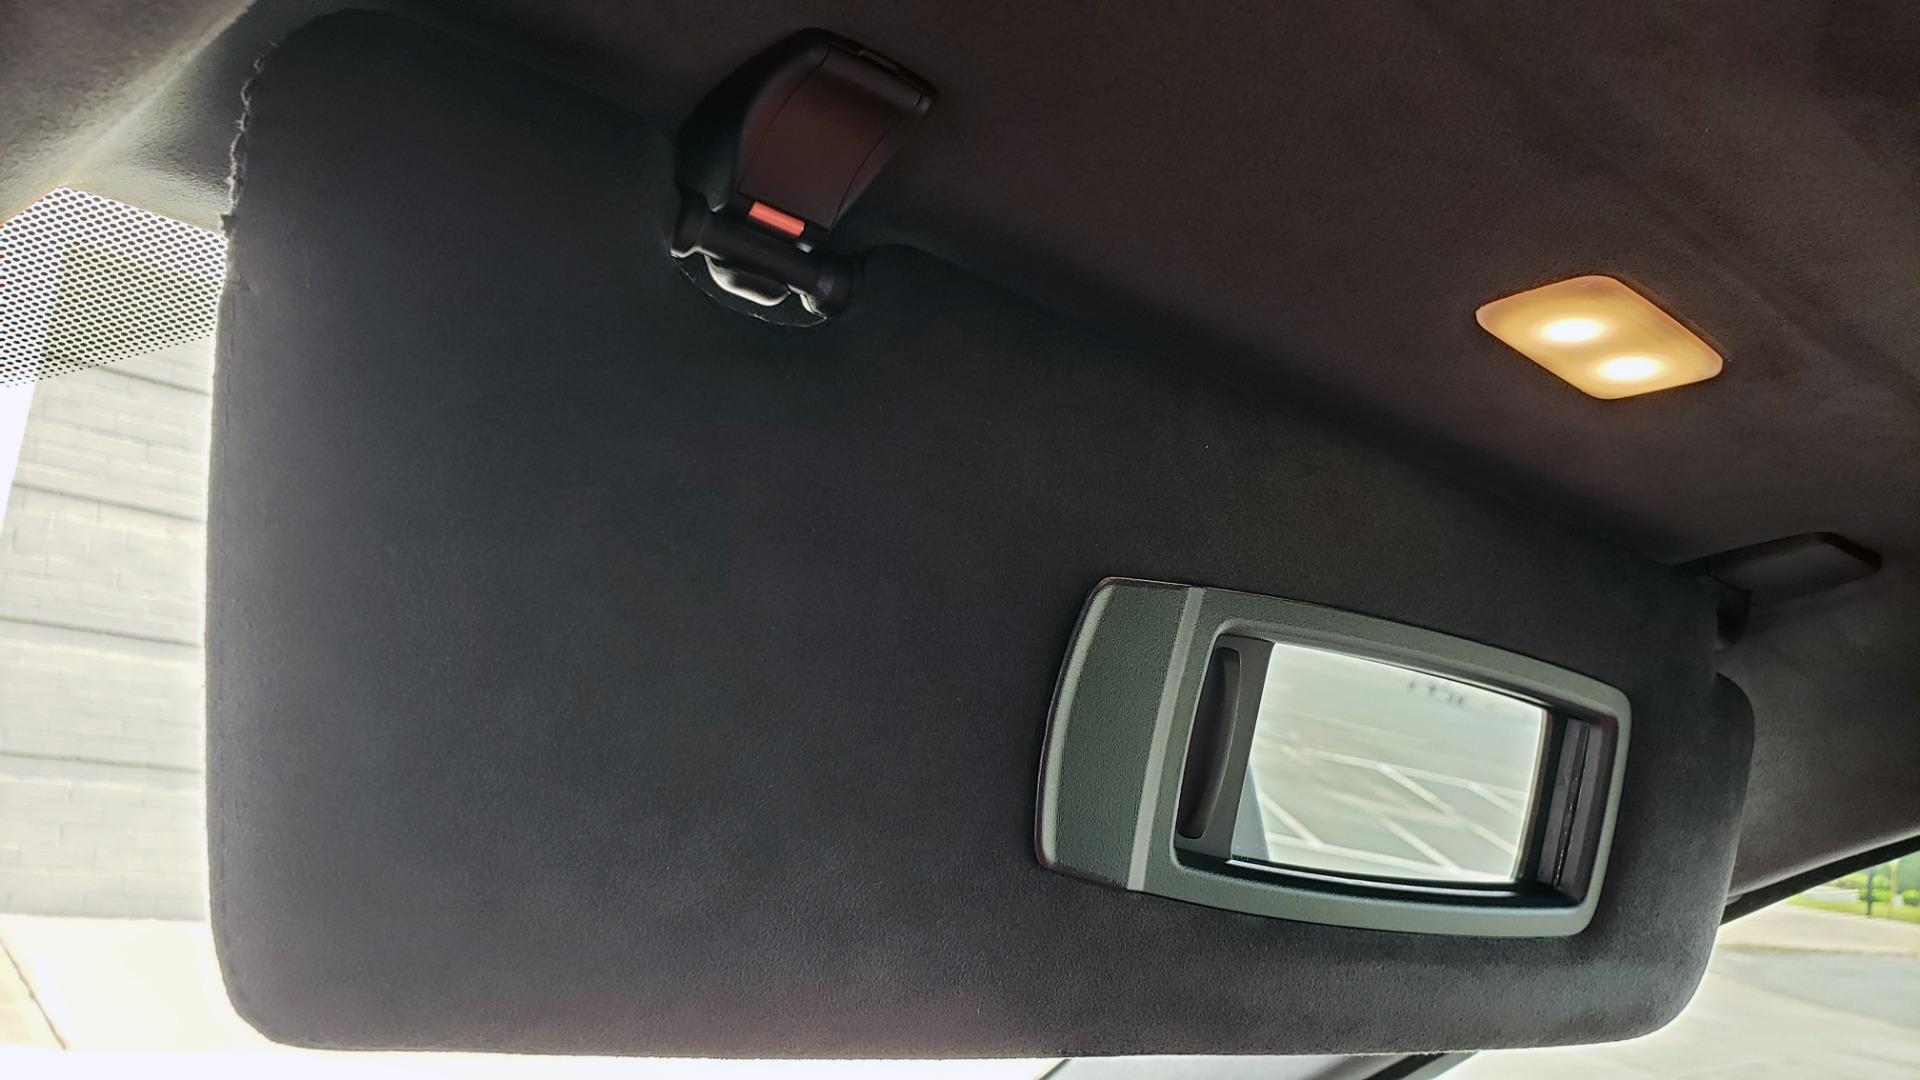 Used 2017 BMW X5 M EXECUTIVE PKG / NAV / DRVR ASST / BSM / HUD / HTD STS / WIFI for sale Sold at Formula Imports in Charlotte NC 28227 55